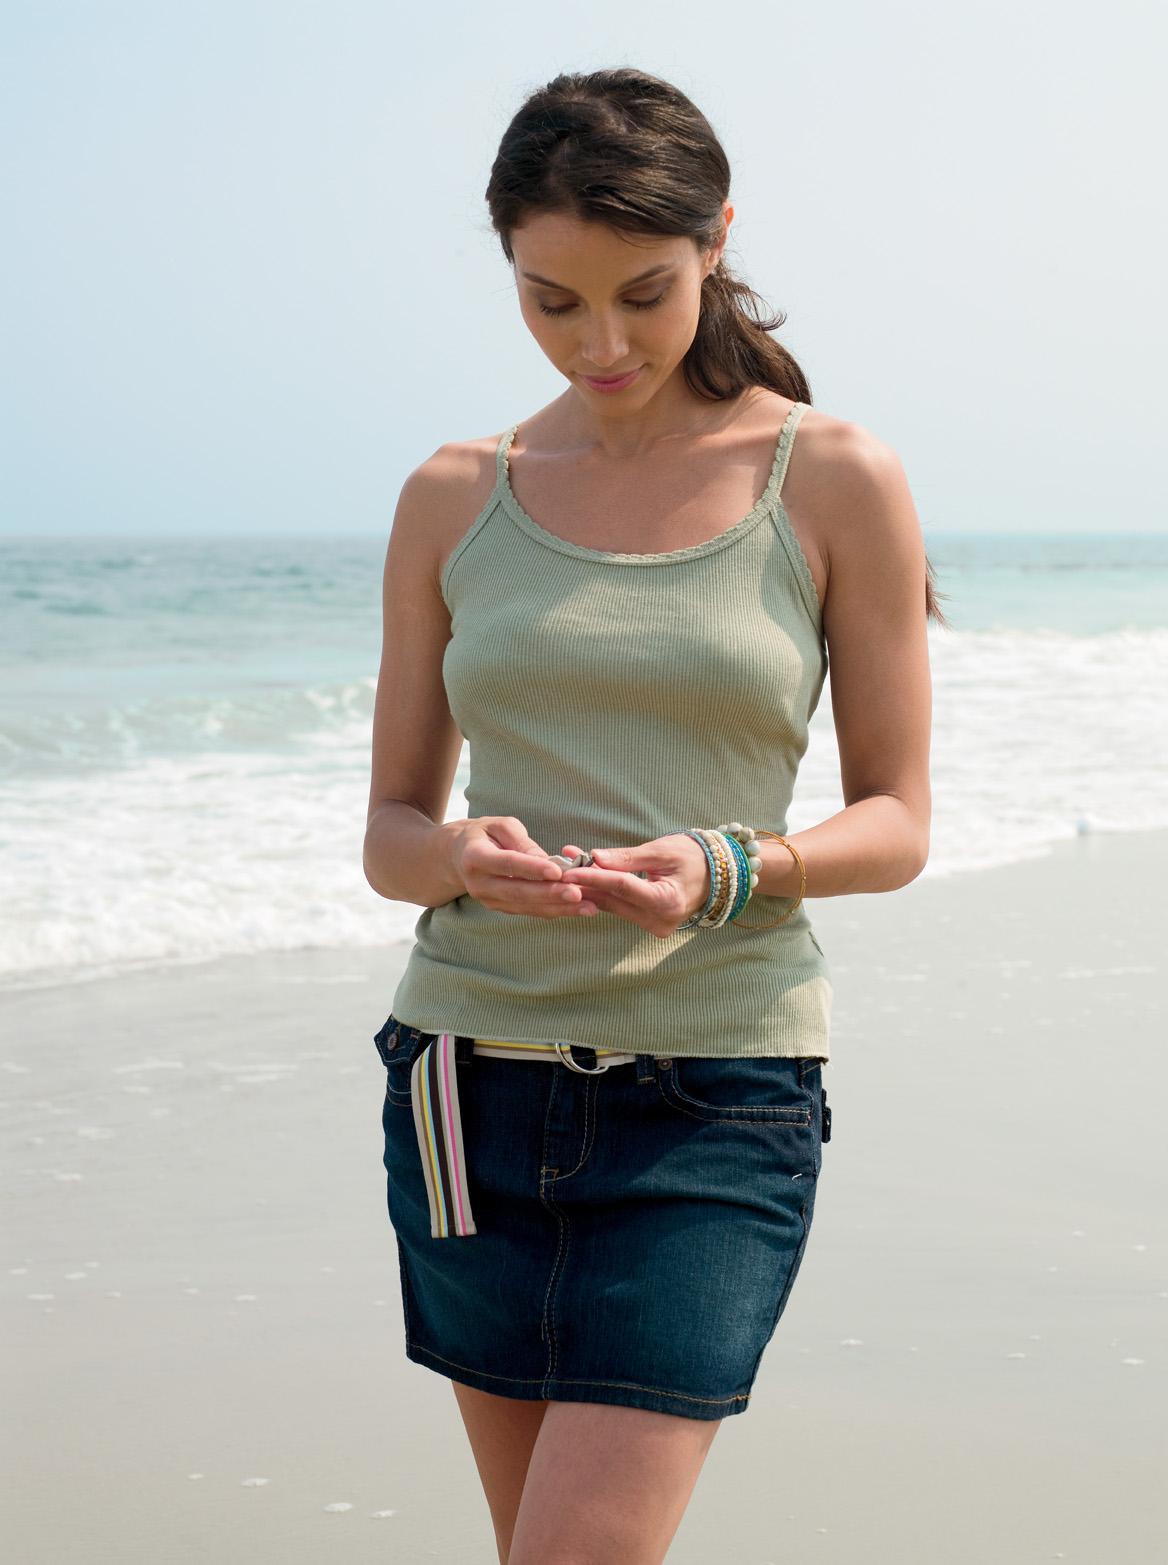 Anvil 2425  Women's Ringspun 2x1 Rib Tank with Contrast Stitching